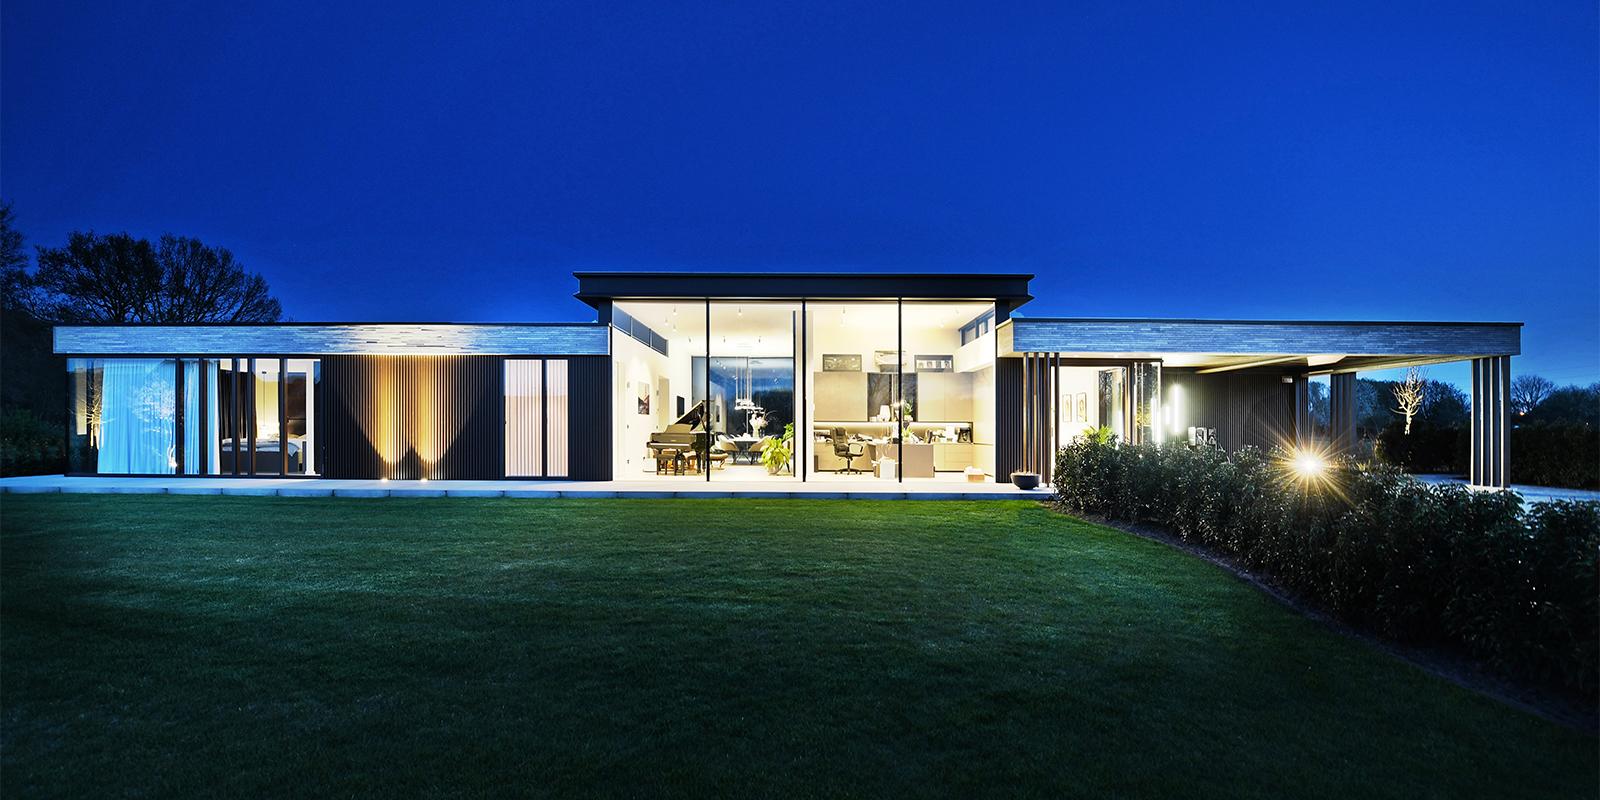 Modernevilla | Boxxis architecten, the art of living